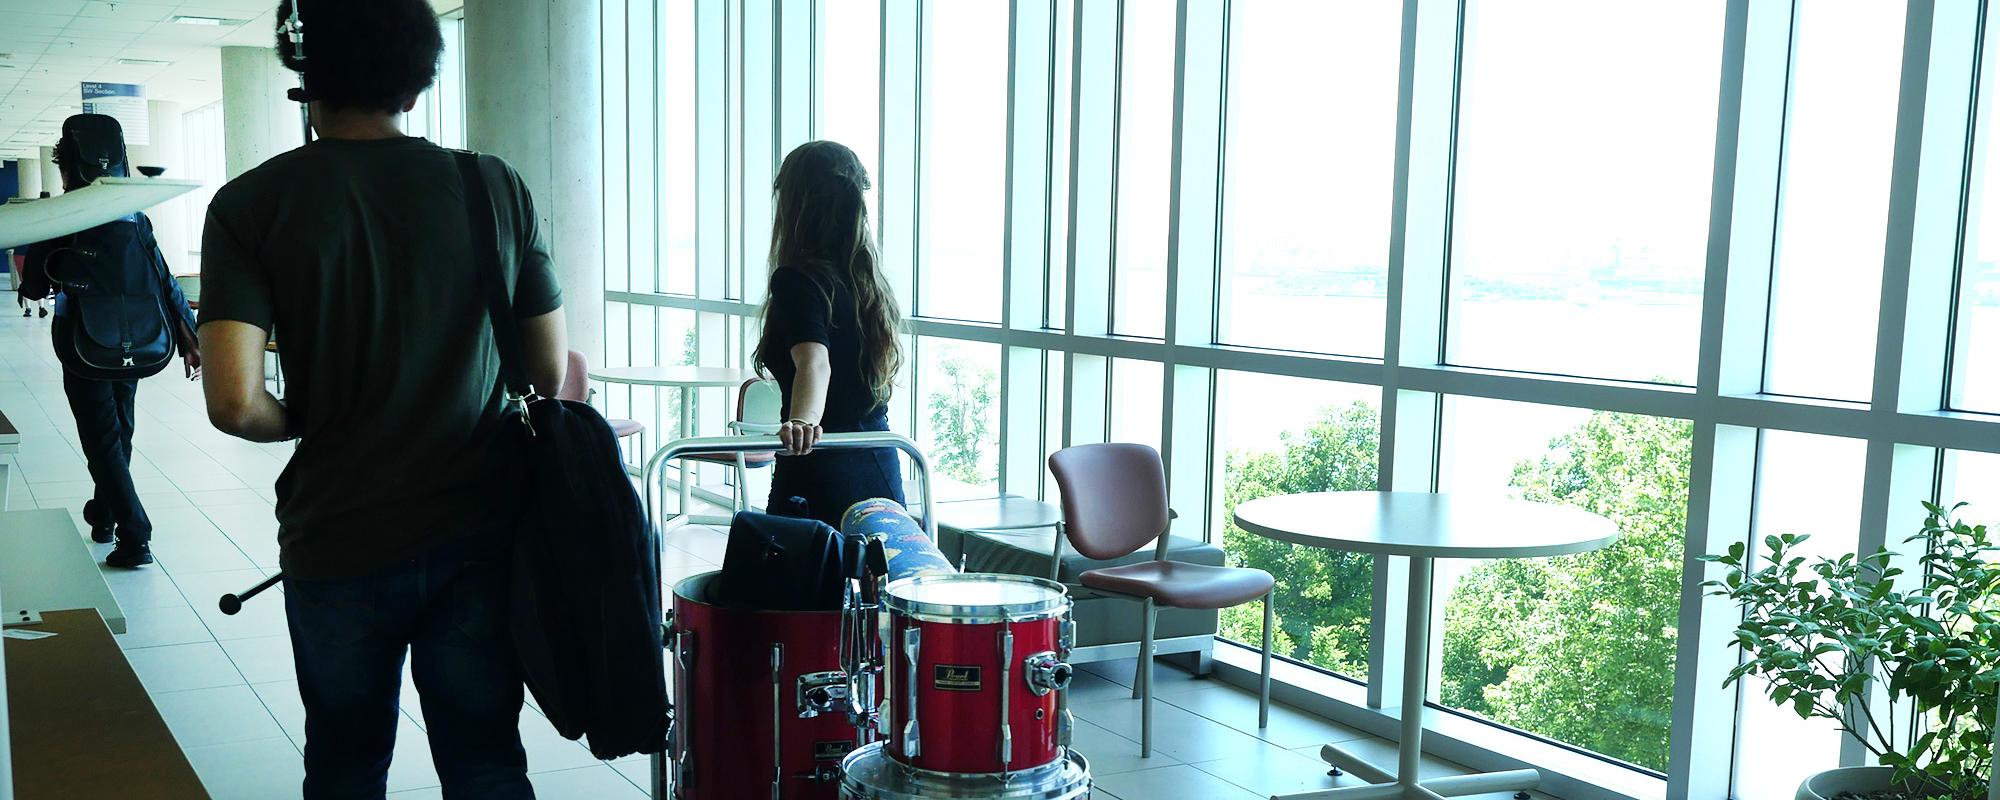 Creative Music Workshop students in Halifax NS NSCC